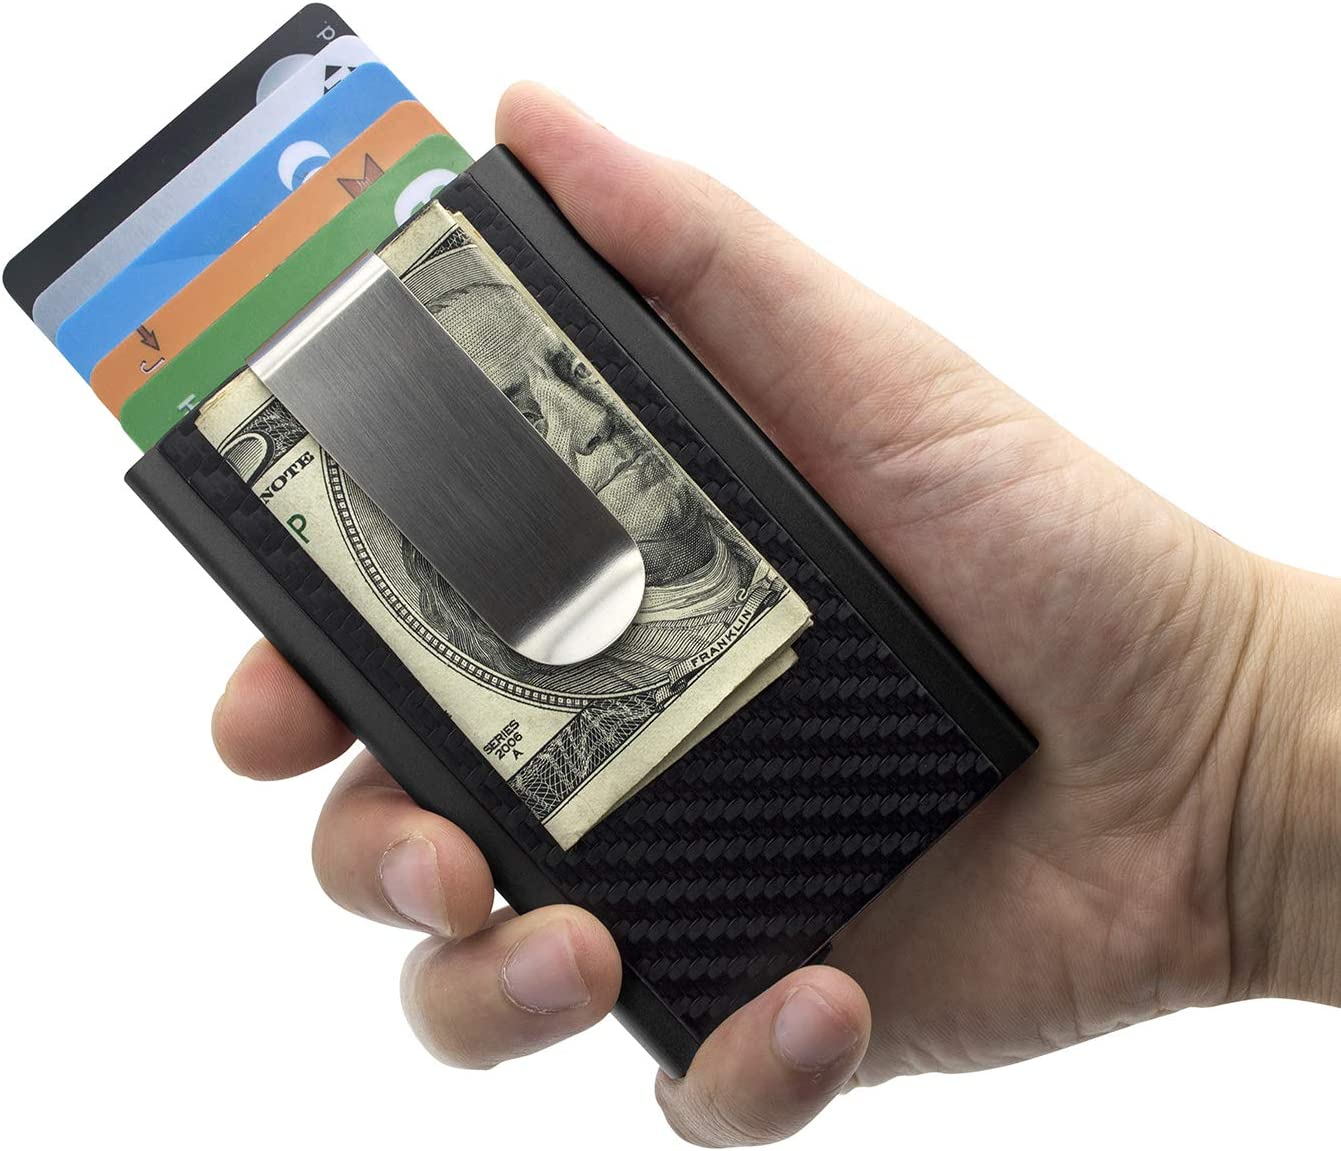 Hot RFID Blocking Metal Wallet Minimalist Wallets Credit card Holders Money Clip